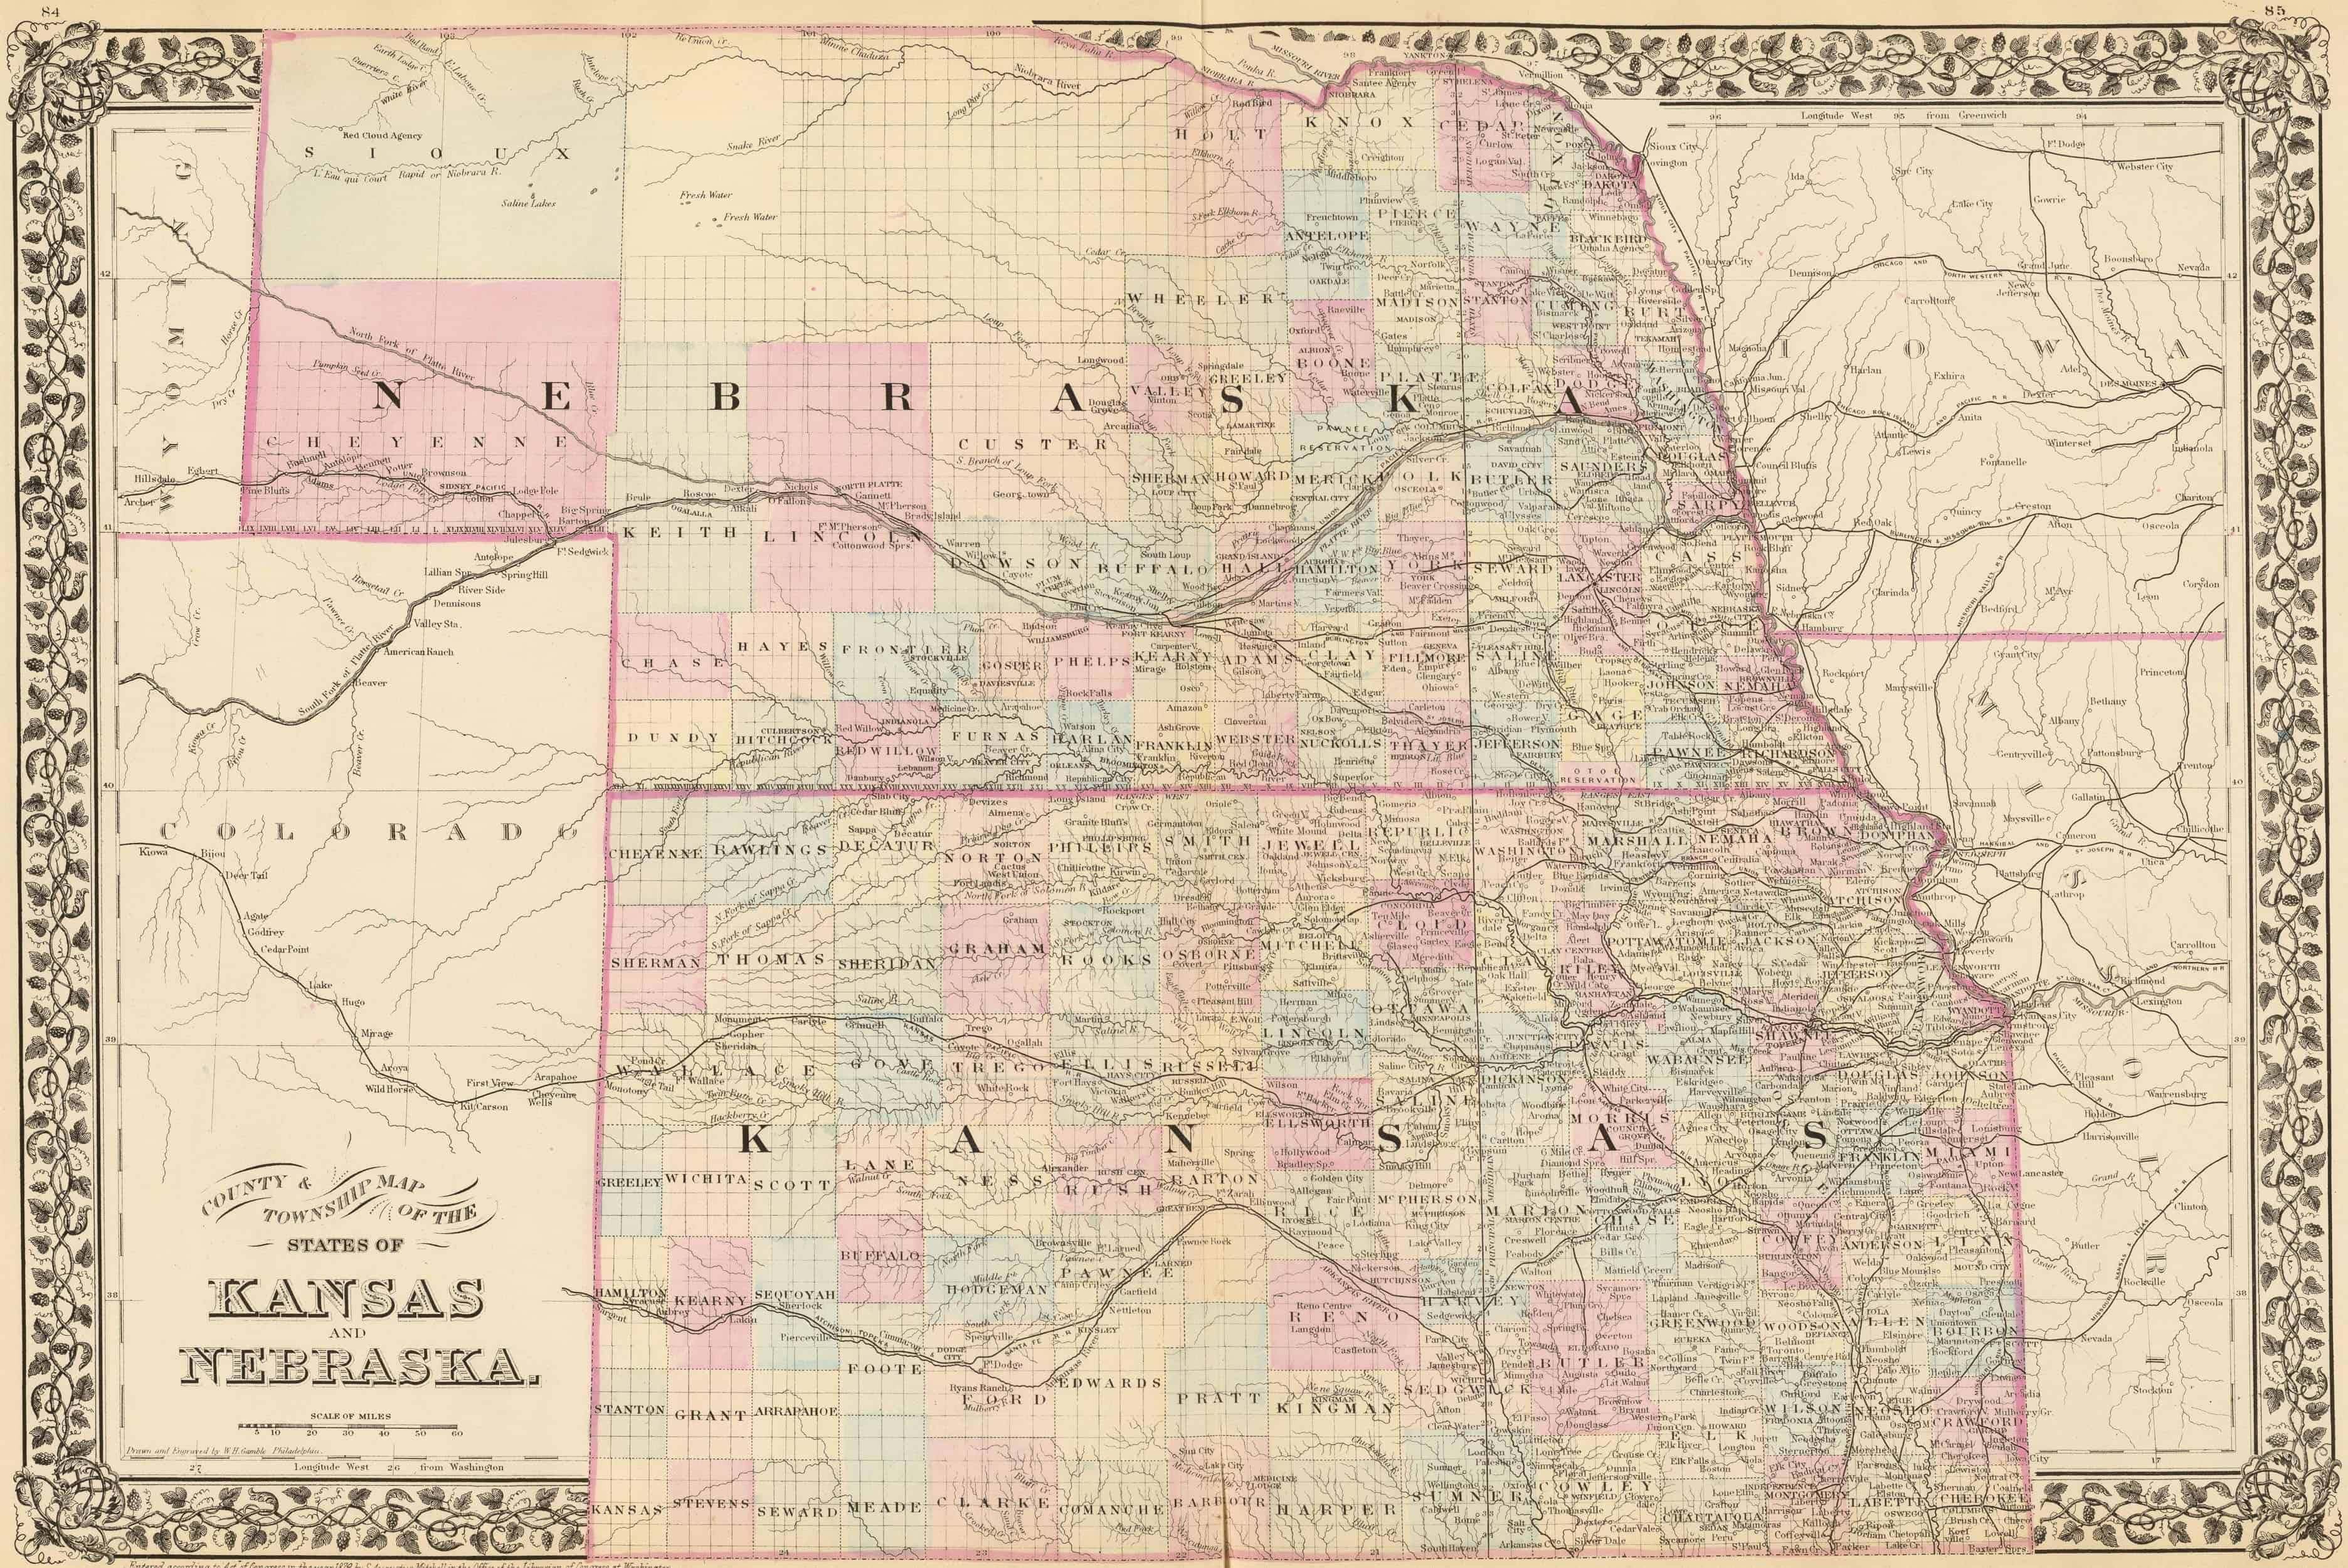 map of nebraska and kansas Old Historical City County And State Maps Of Nebraska map of nebraska and kansas